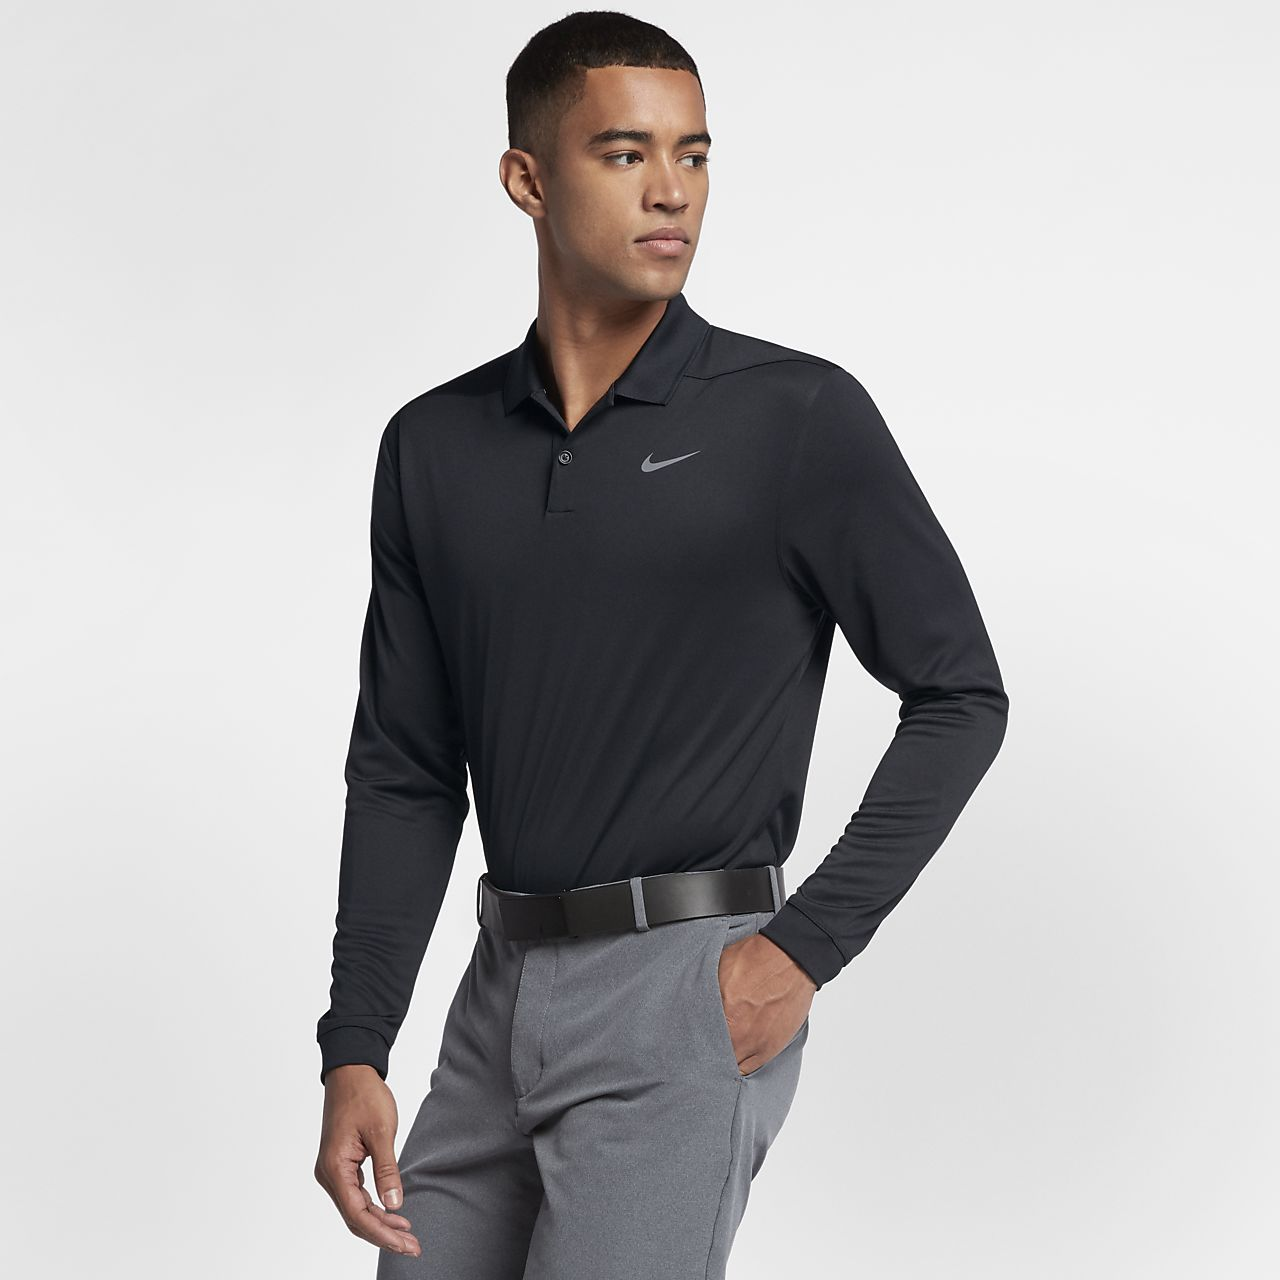 ... Nike Dri-FIT Victory Men's Long-Sleeve Standard Fit Golf Polo